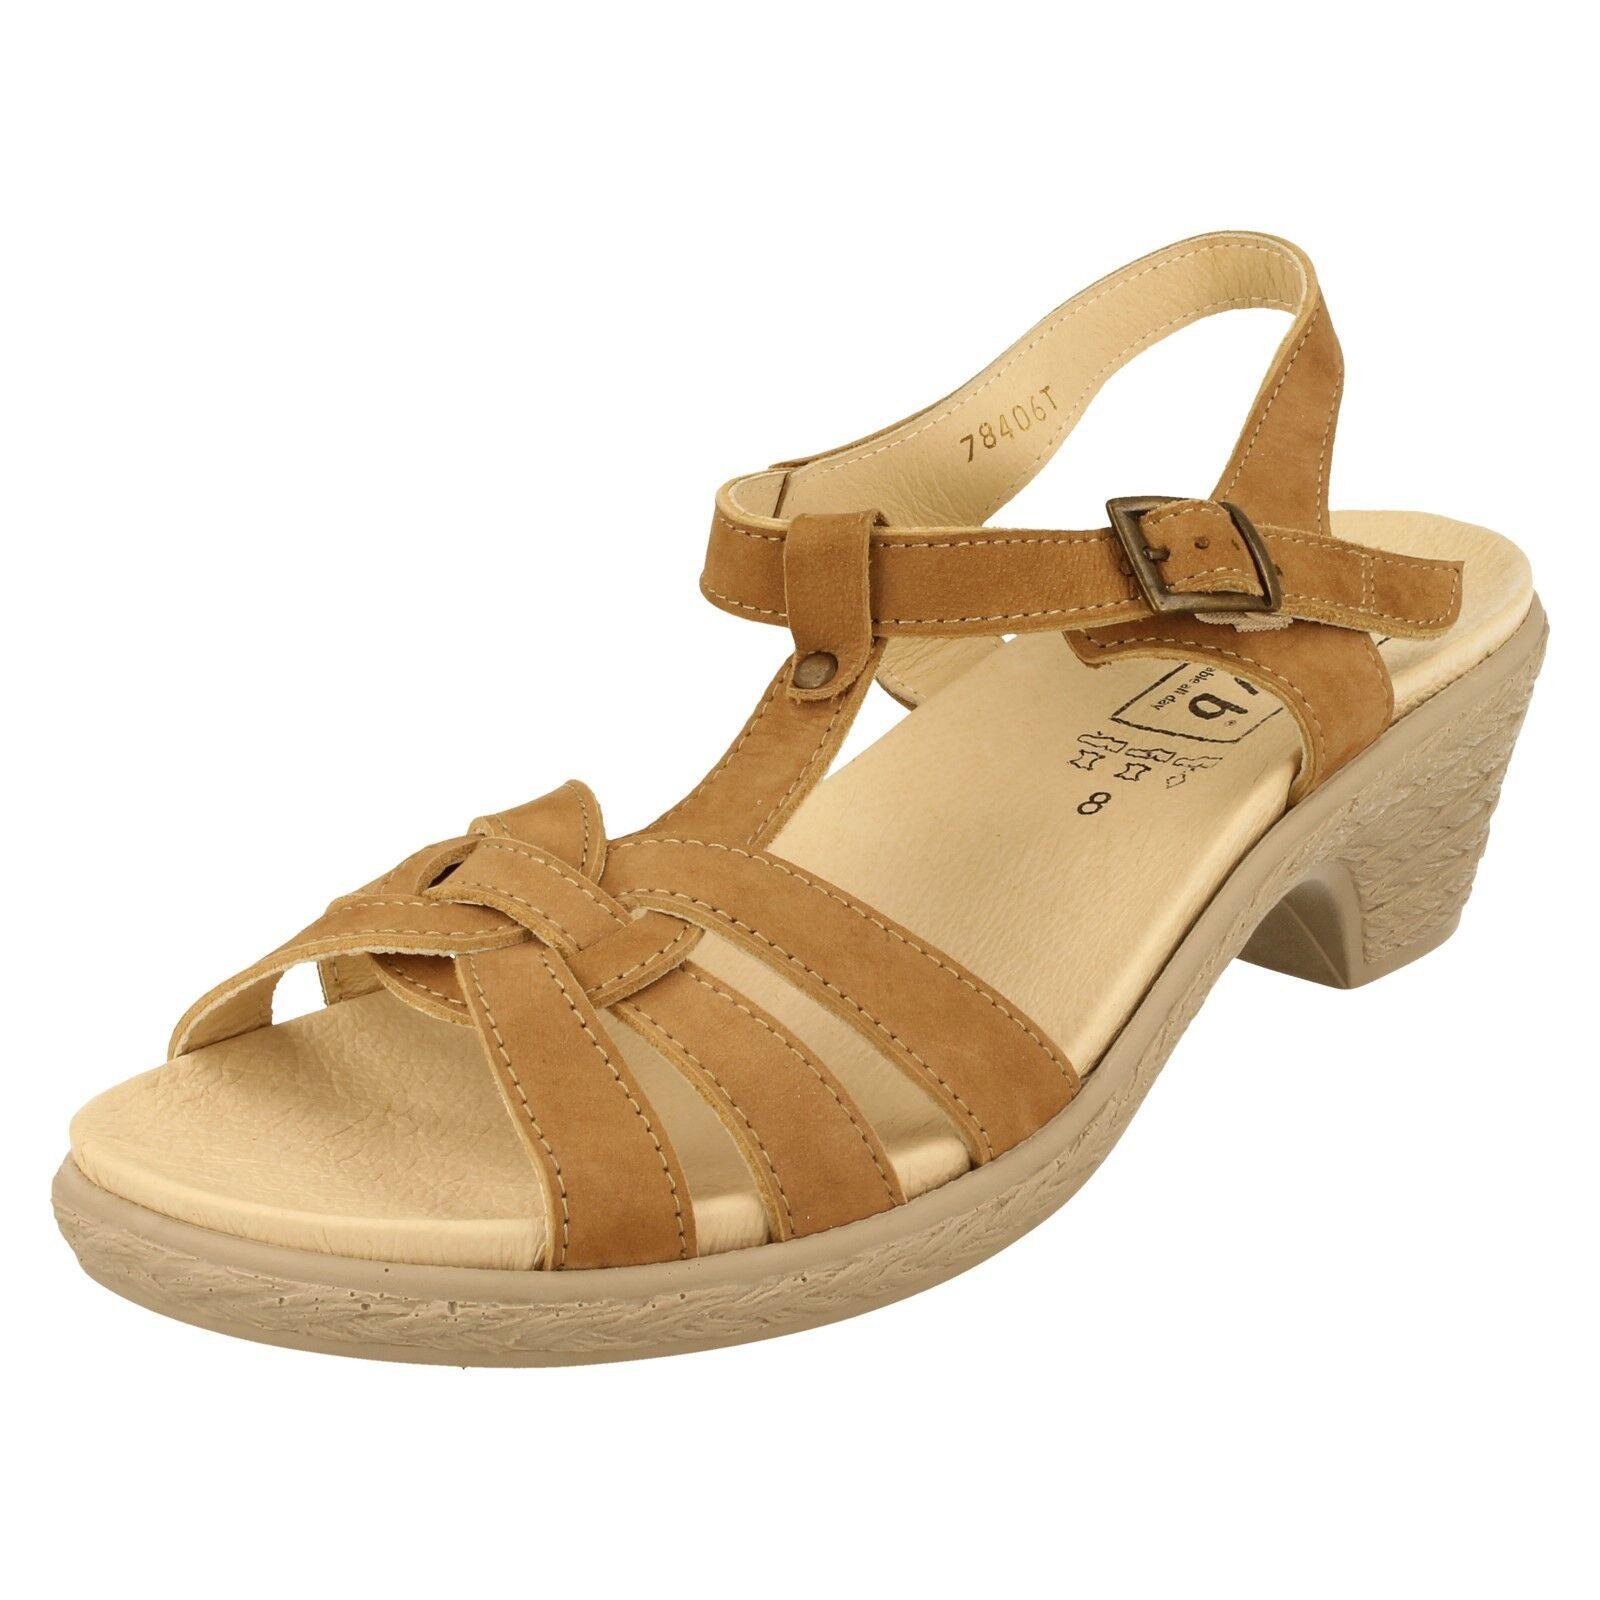 Ladies Easy B DB Sandals - Susanna